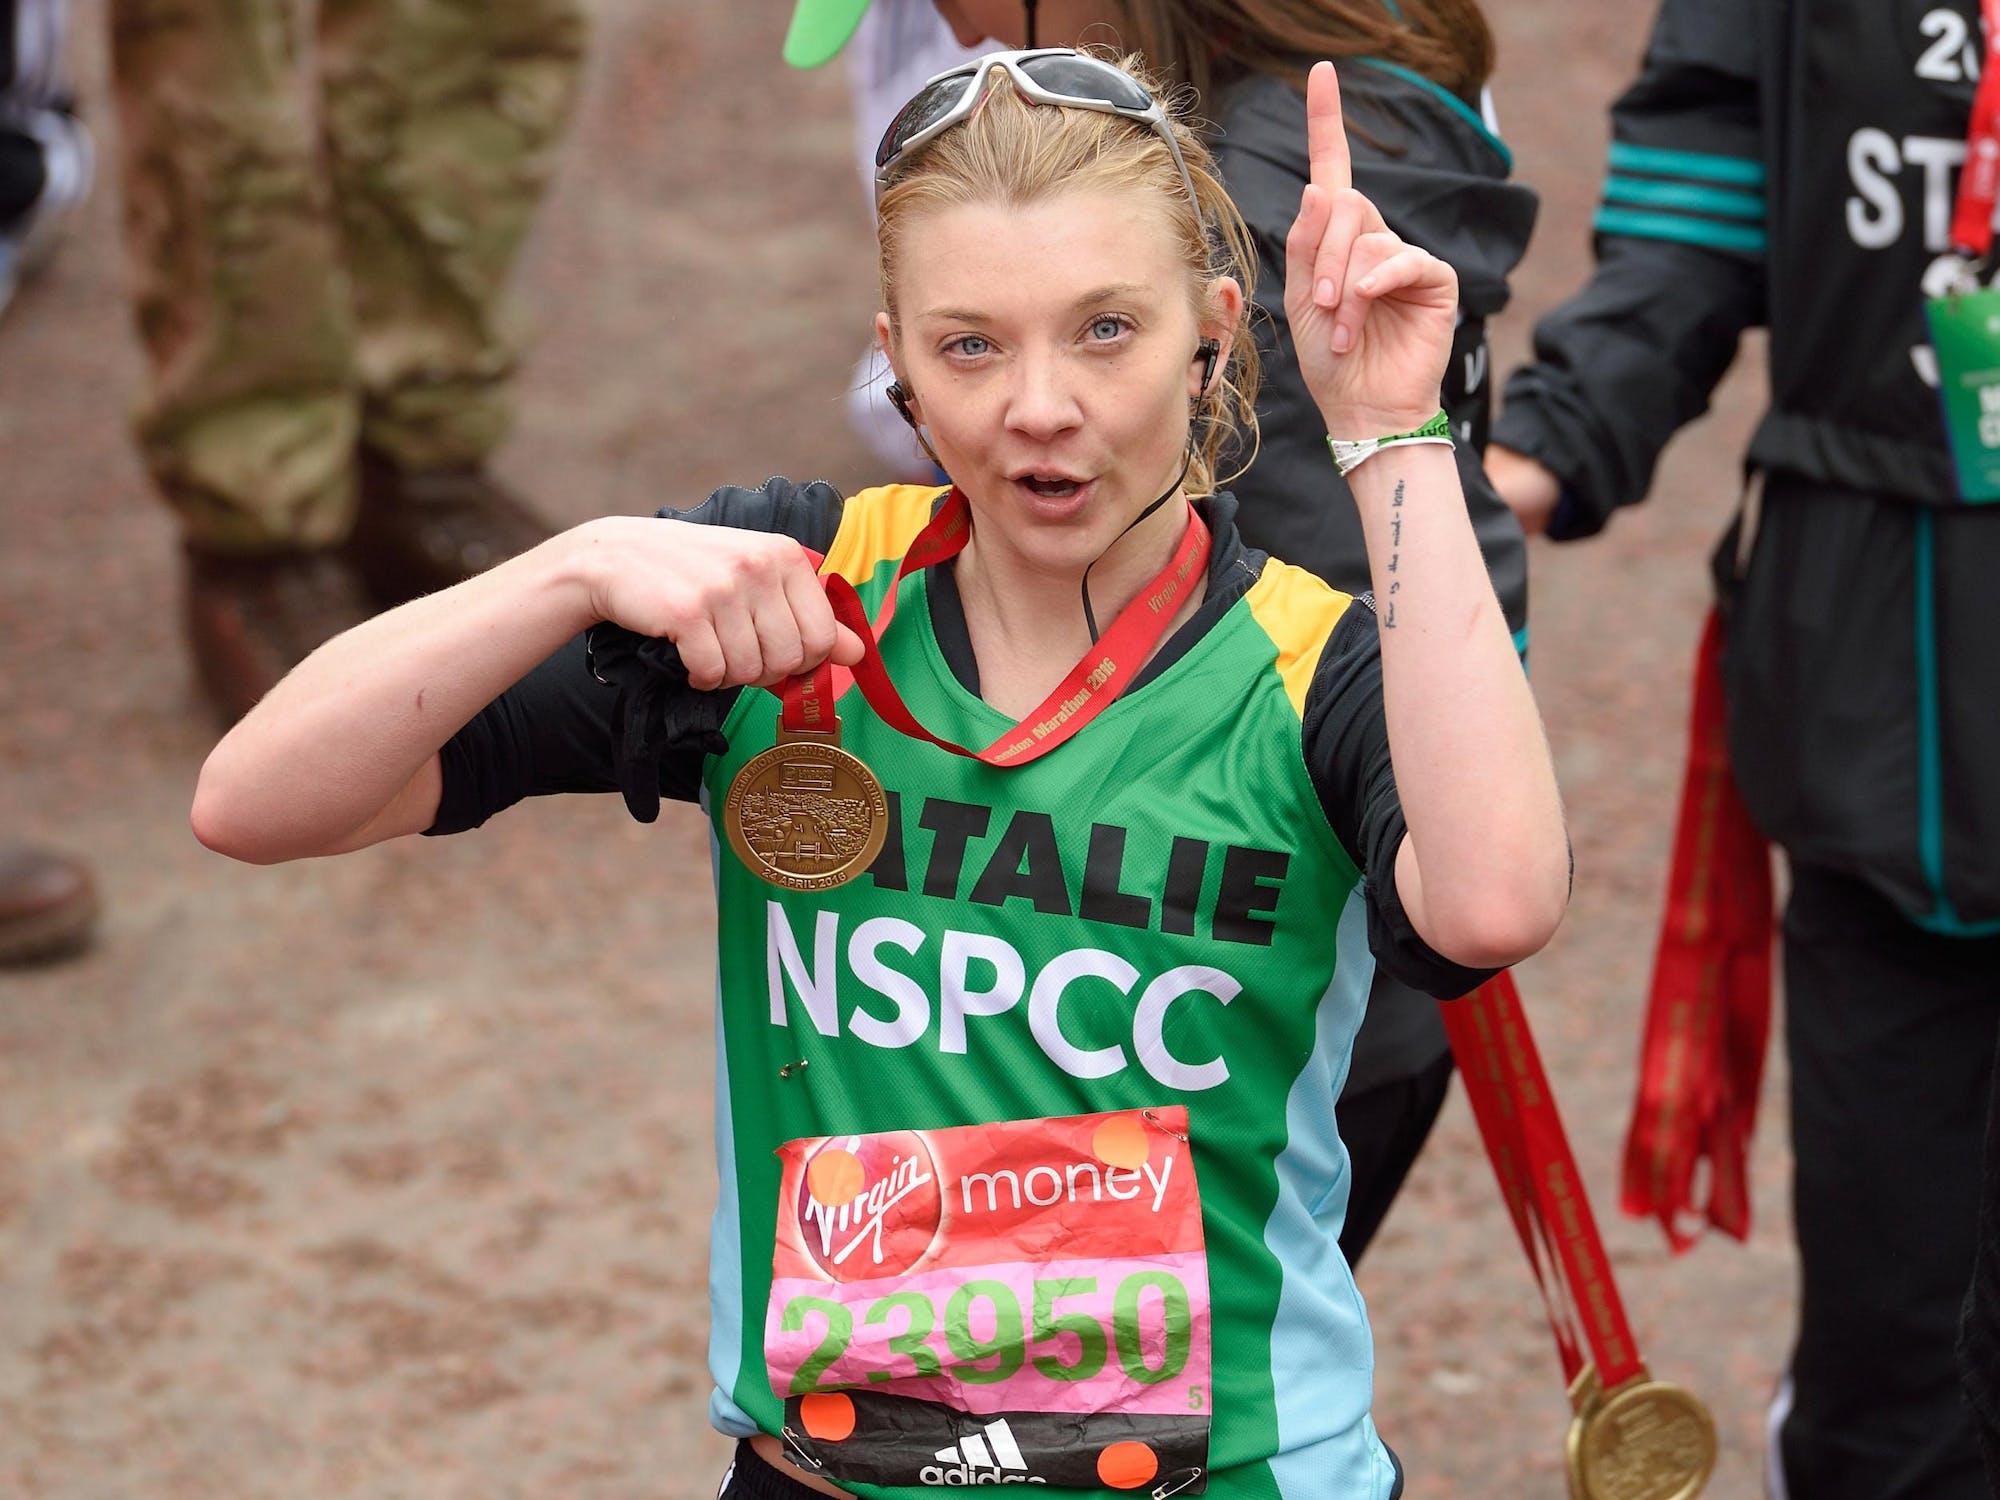 Join #TeamNSPCC for the 2021 Virgin Money London Marathon